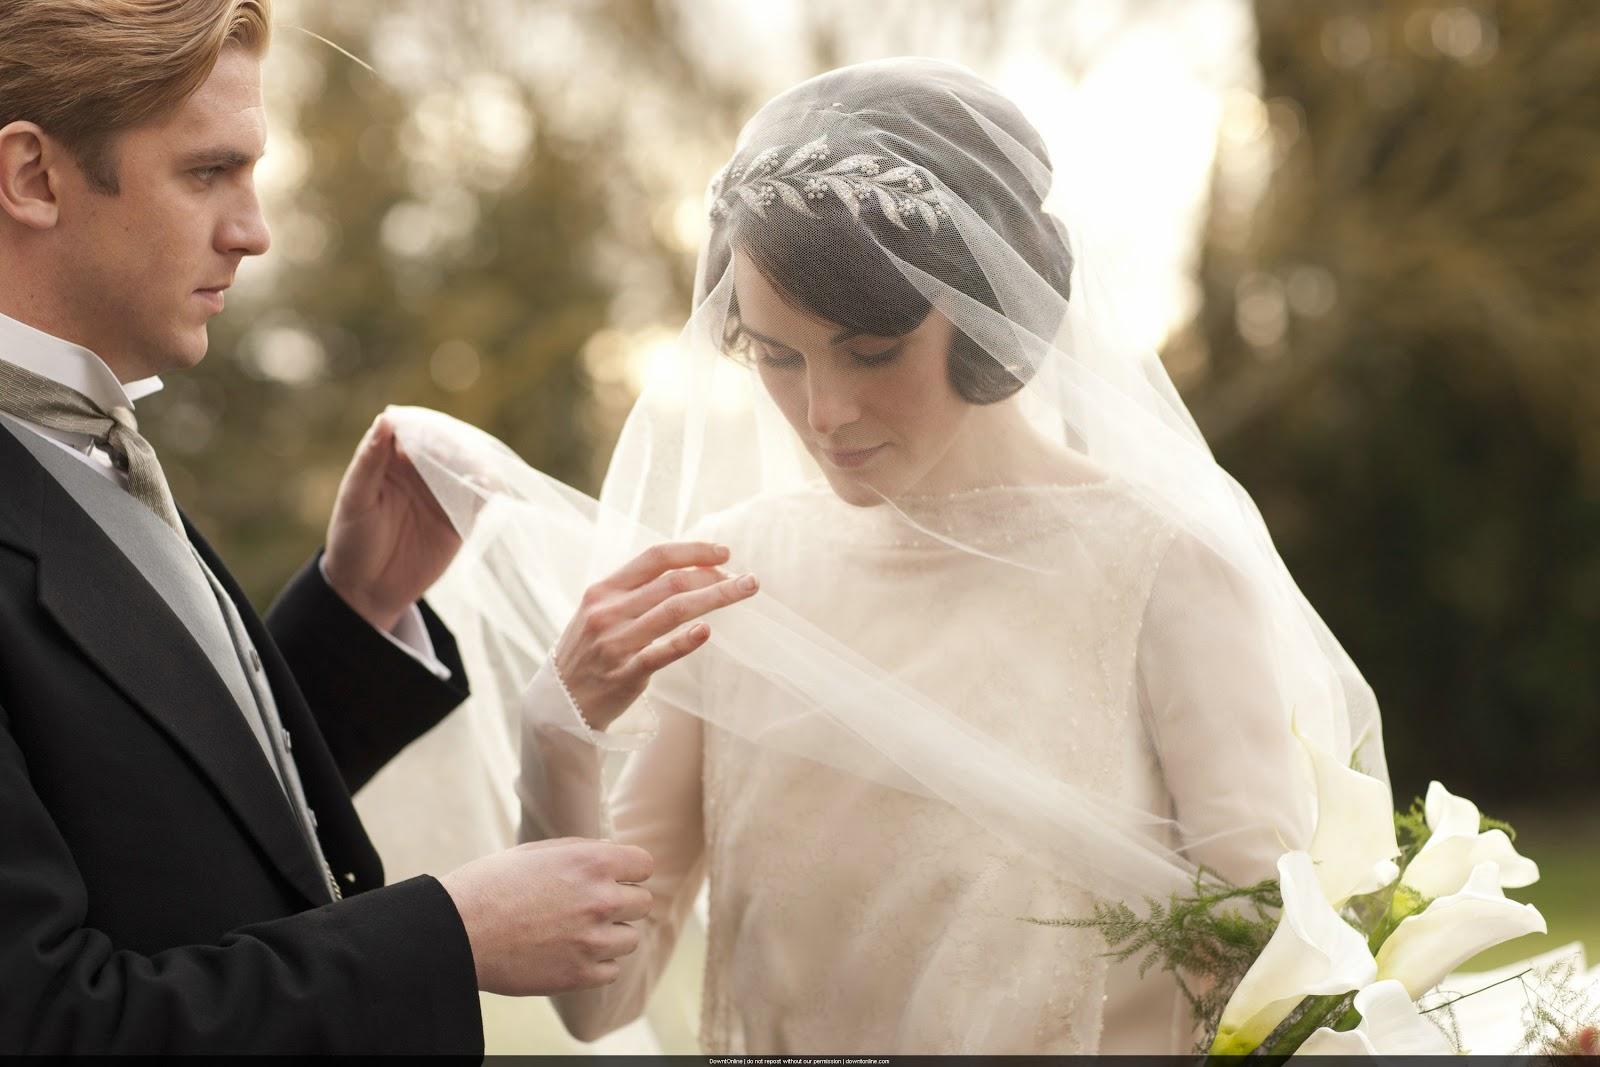 http://2.bp.blogspot.com/-DeKjVhoU7fA/UQRKyEyYYpI/AAAAAAAABSw/dJwpuWkSscU/s1600/Mary-and-Matthew-Crawley-Wedding-downton-abbey-32428314-3000-2000.jpg